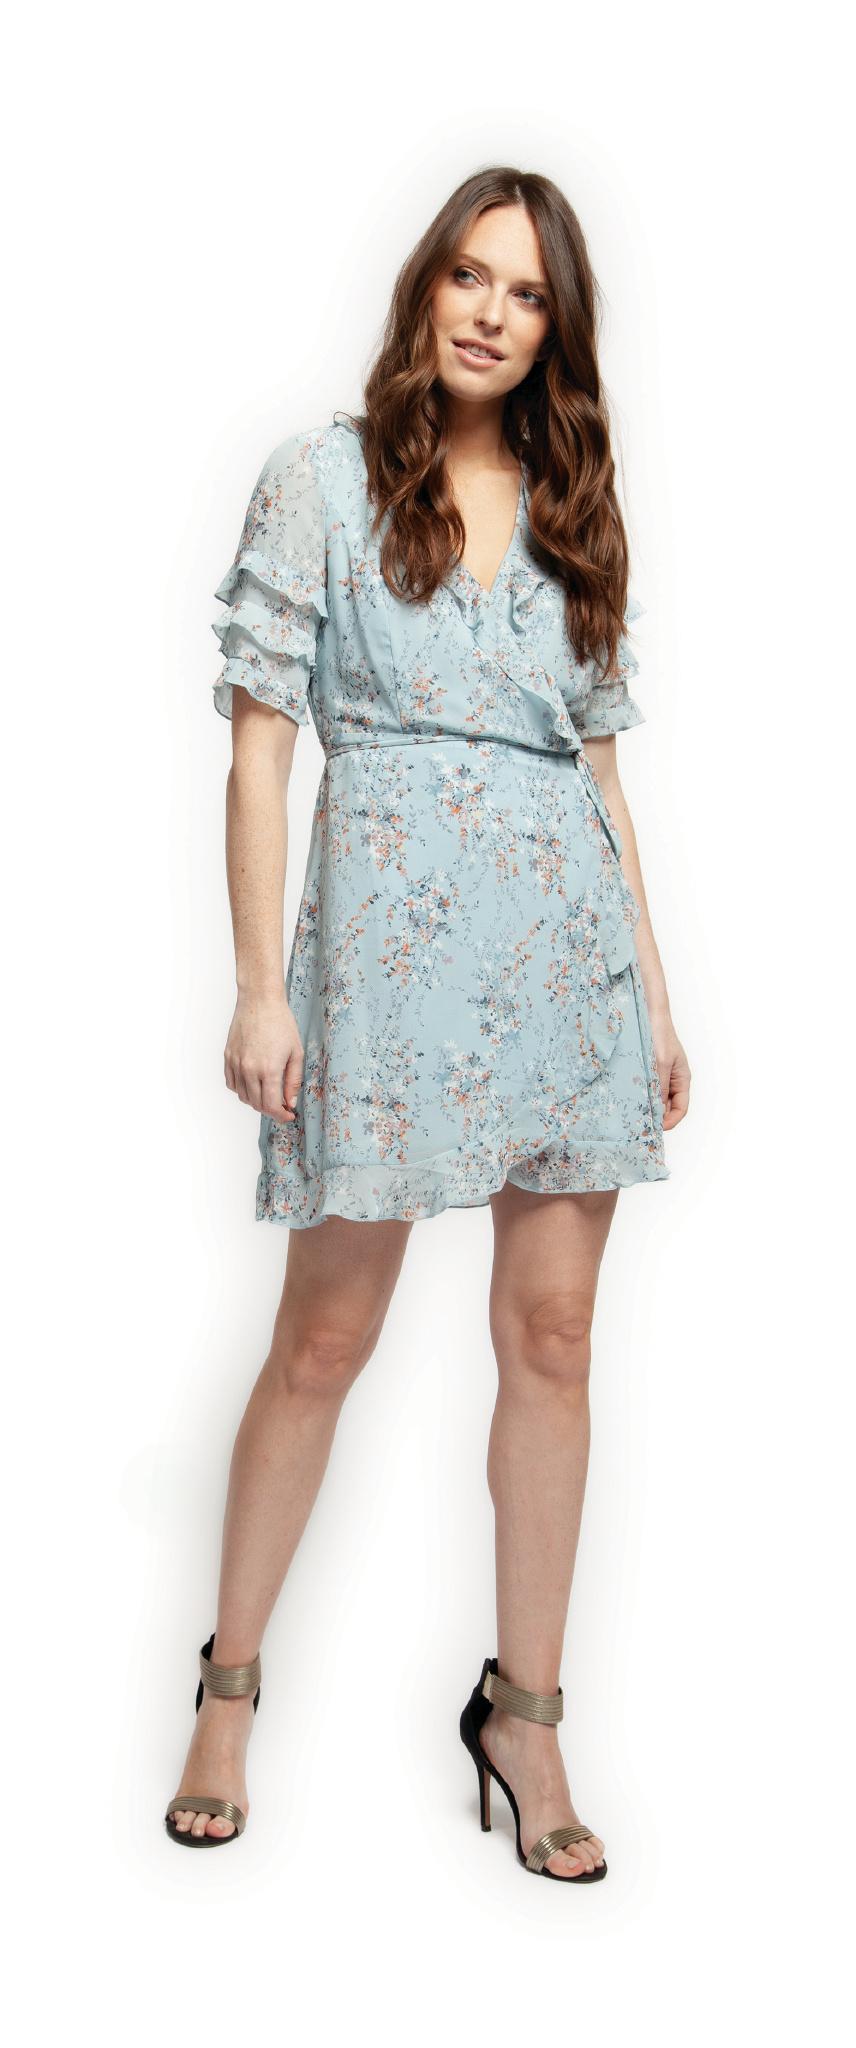 Black Tape Dress S/Slv Wrap Dress w/ Ruffle Detail